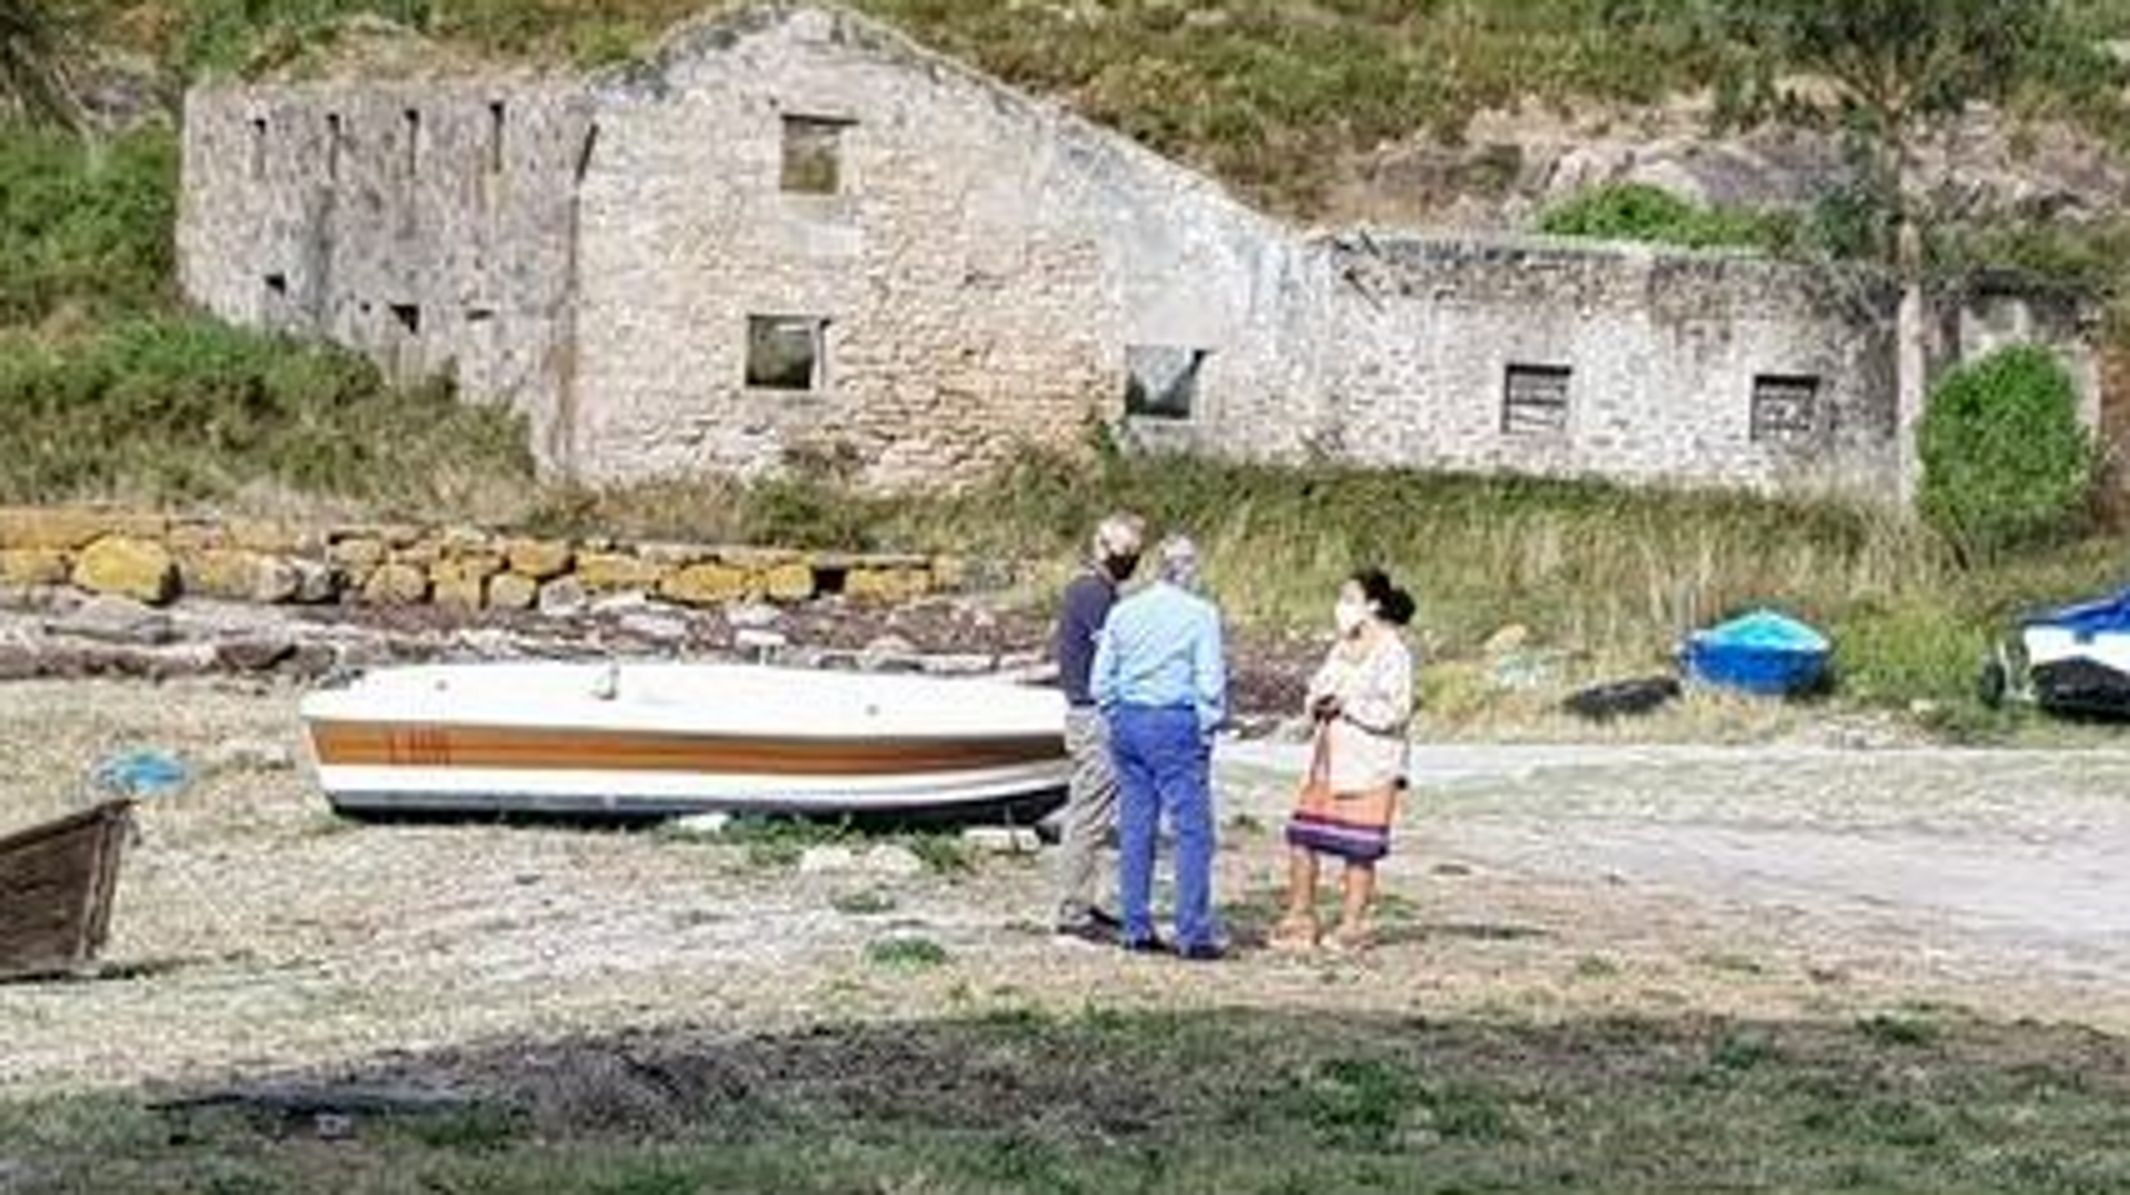 Trabajadores de Alcoa en Burela.Alcaldesa y Eimil, visitando Caneliñas